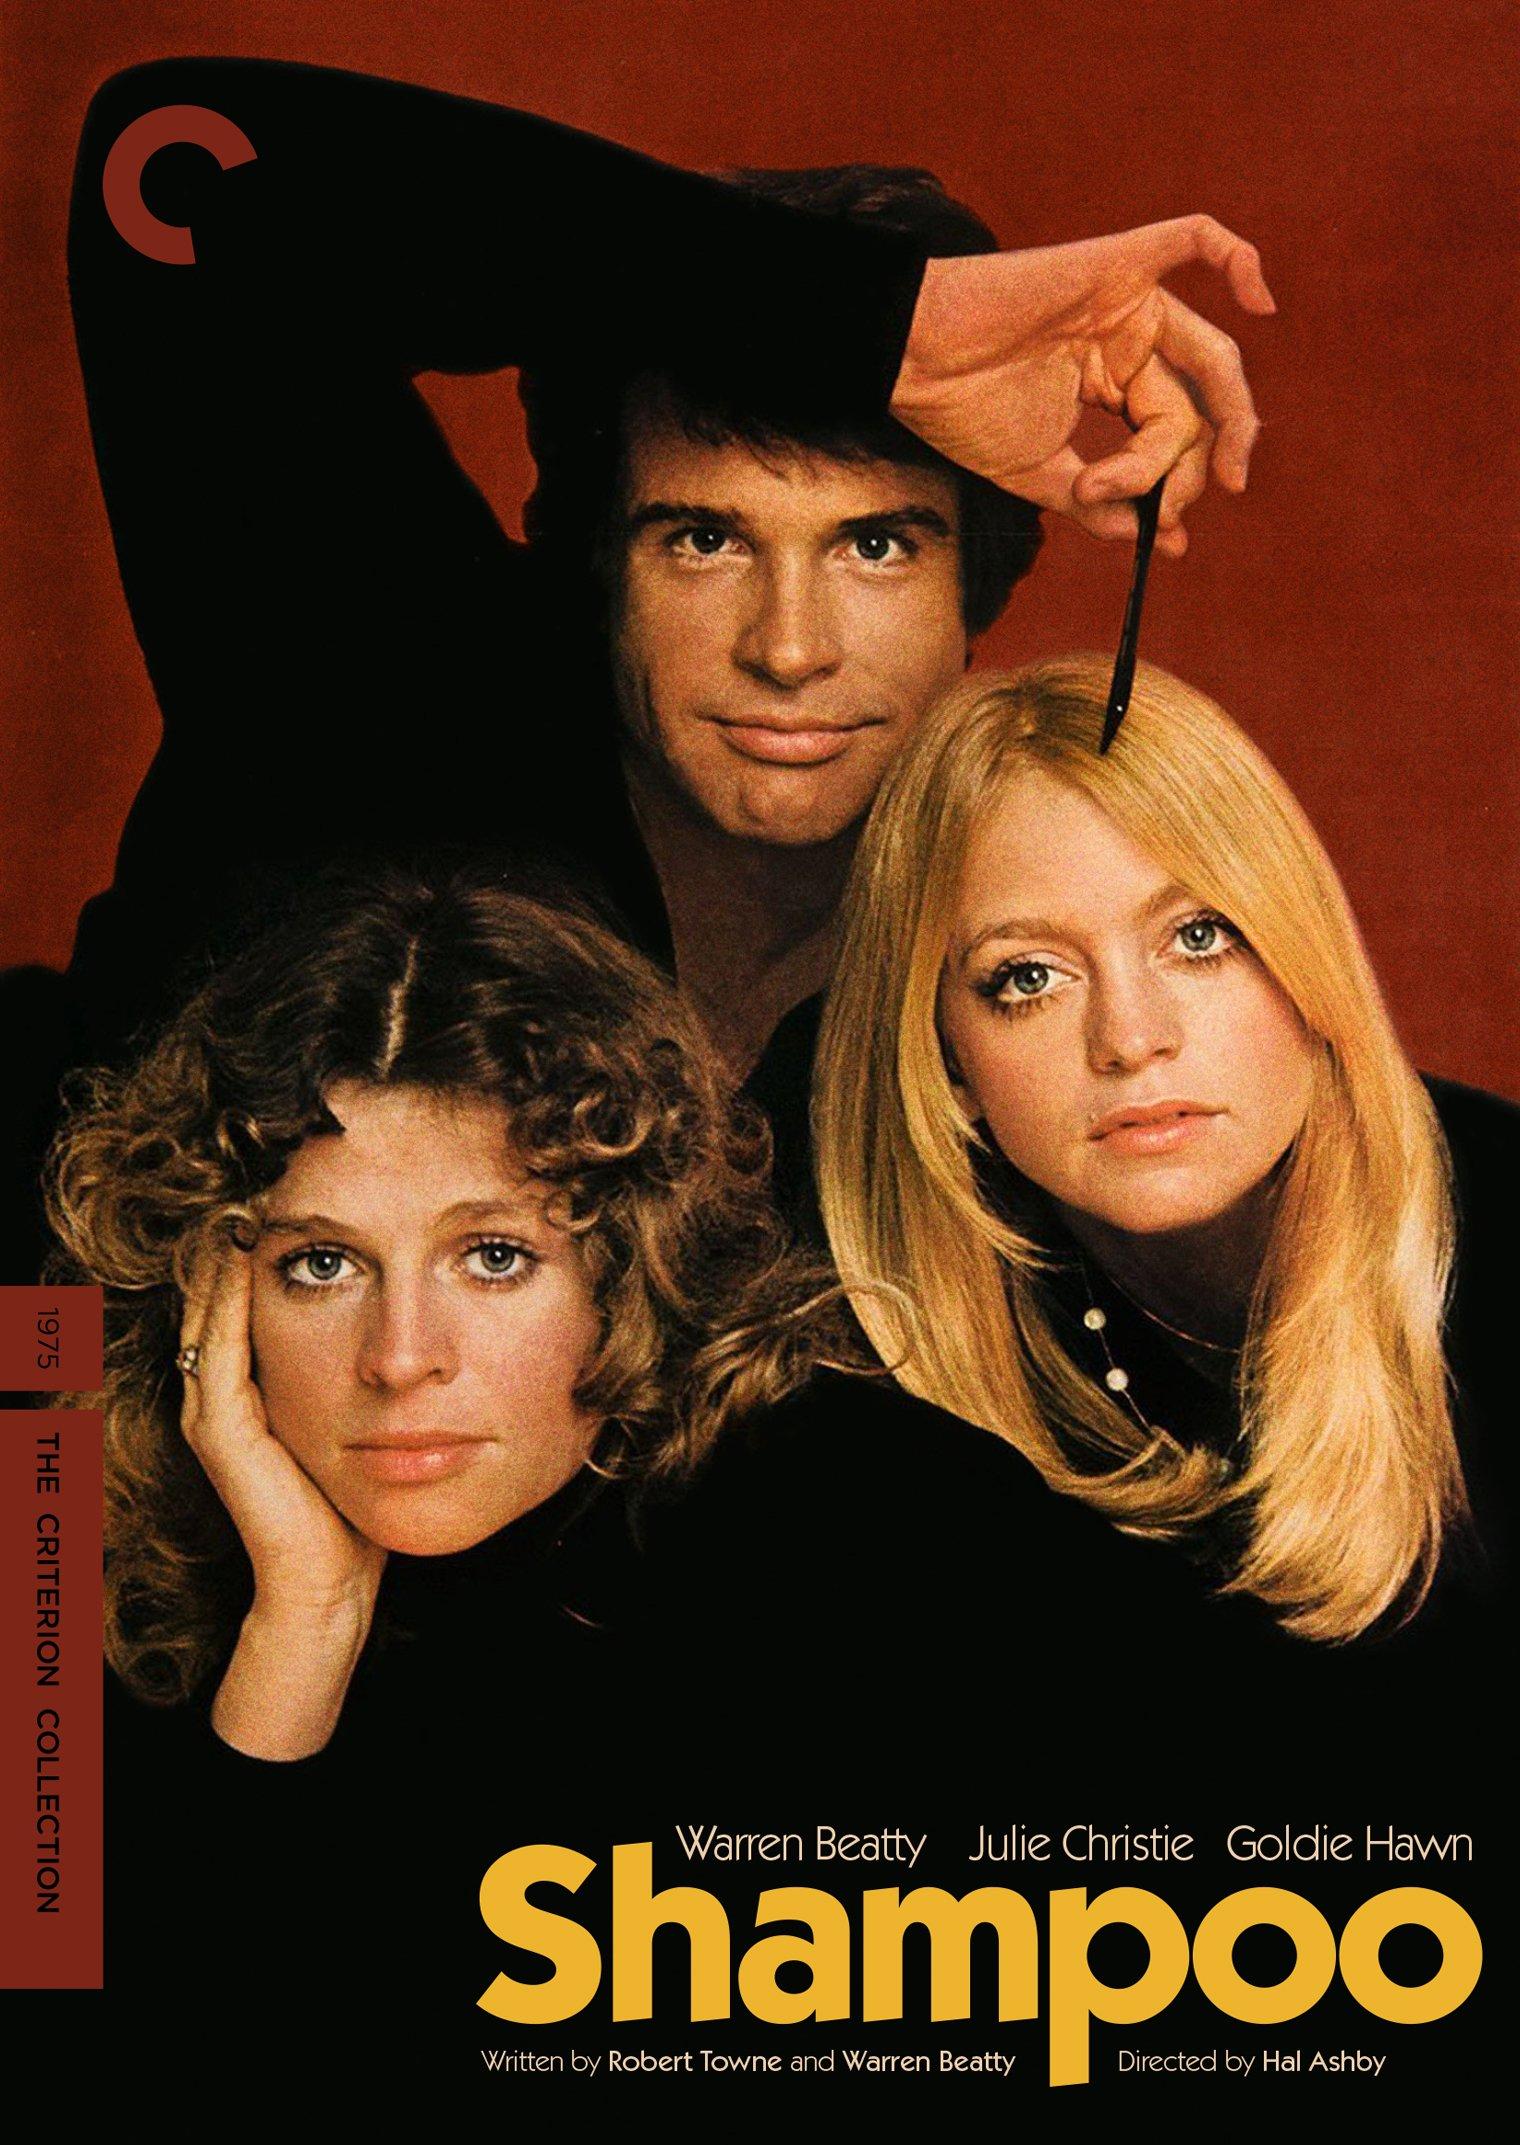 DVD : Warren Beatty - Shampoo (criterion Collection) (Special Edition, 4K Mastering, Restored, Widescreen, Mono Sound)